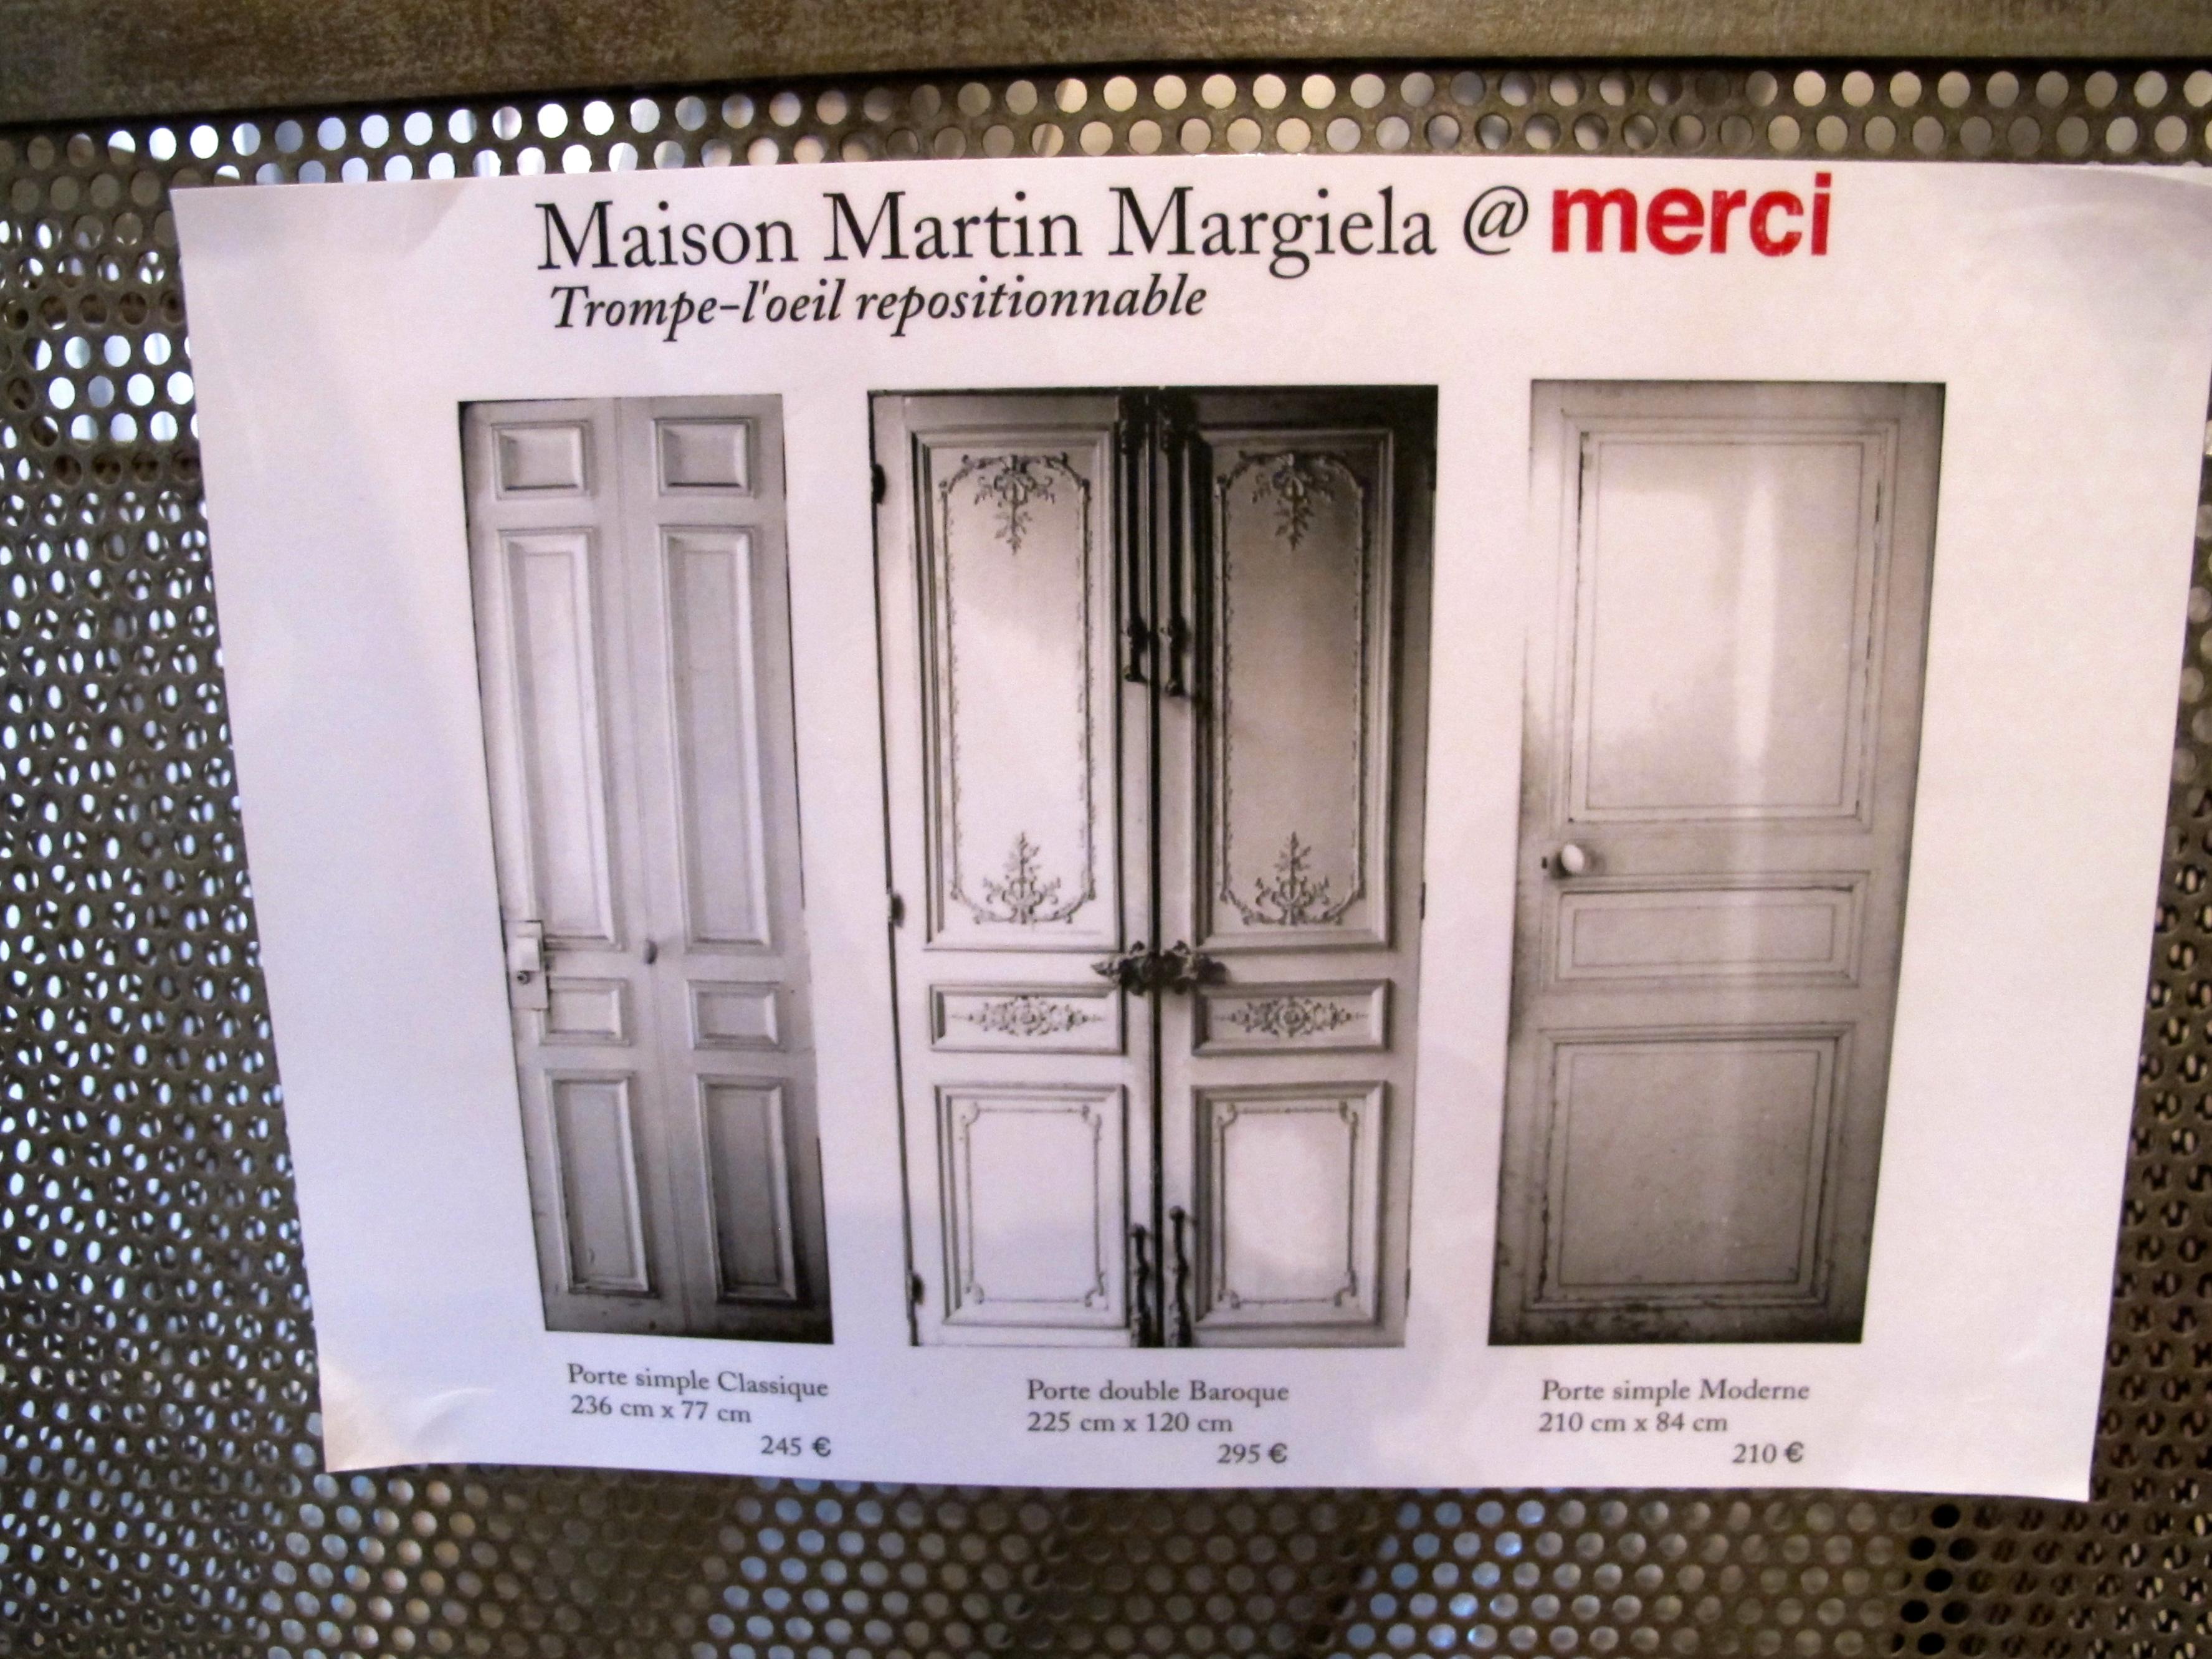 Maison paris martin margiela exclusive photo